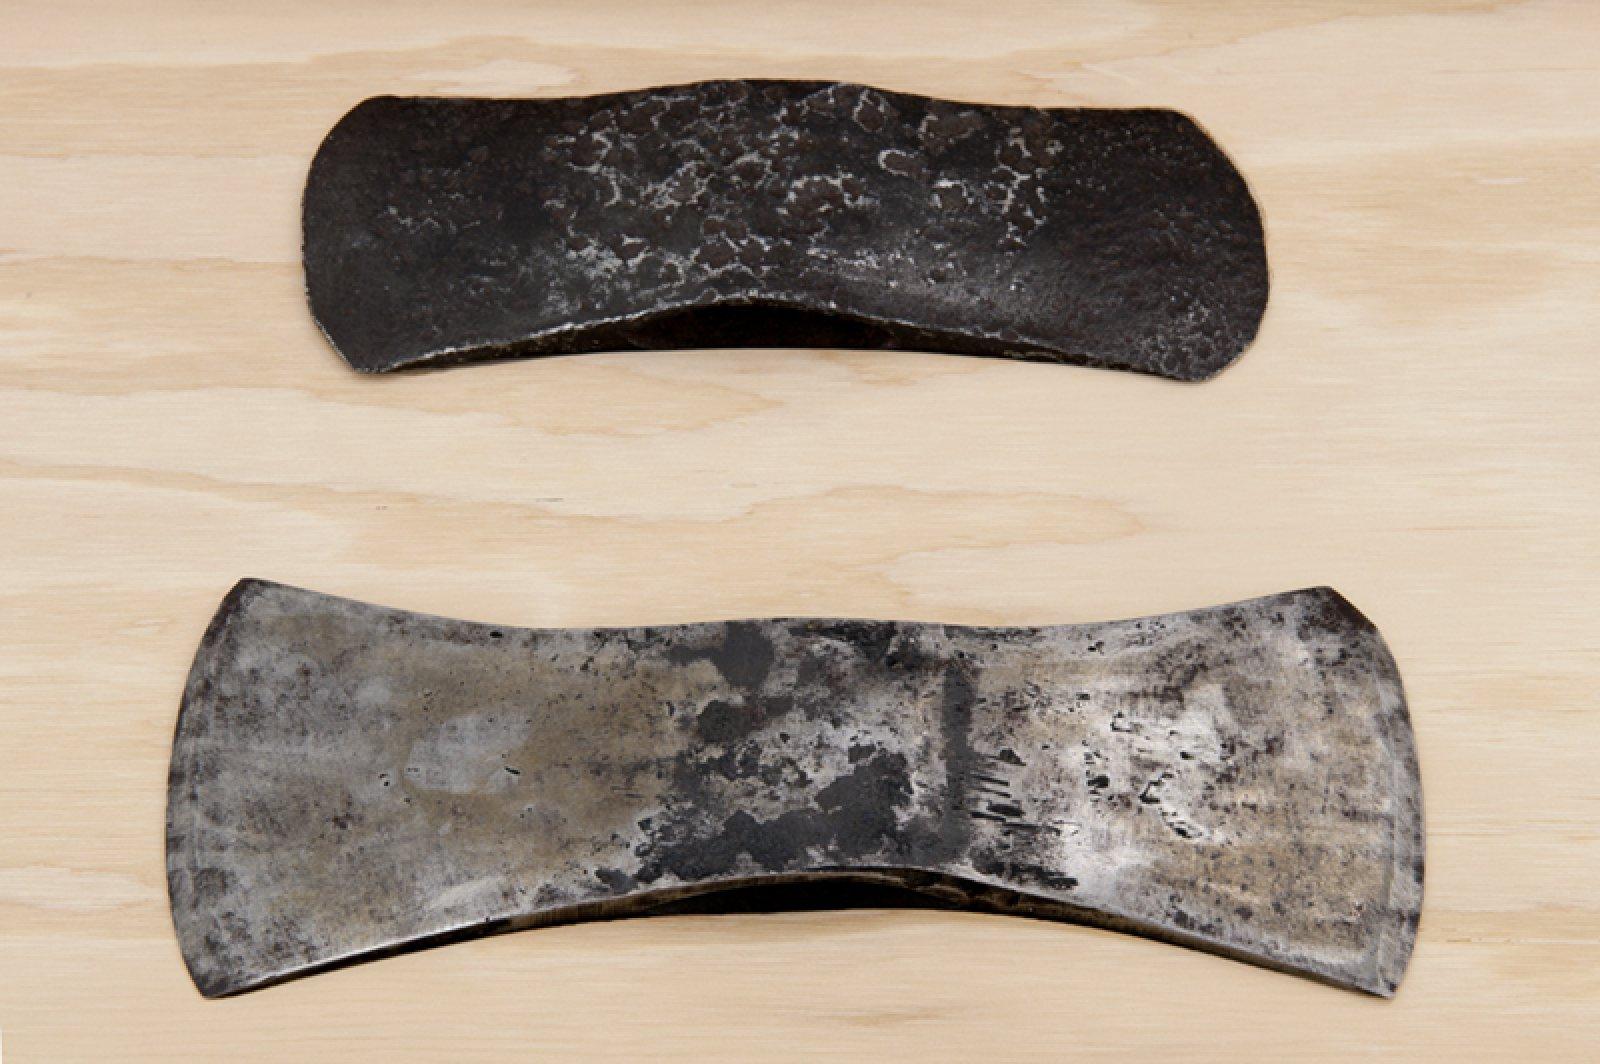 Brian Jungen,Bushido(detail), 2012,fir plywood, axe heads, tree, book,16 x 31 x 16 in. (41 x 79 x 41 cm)